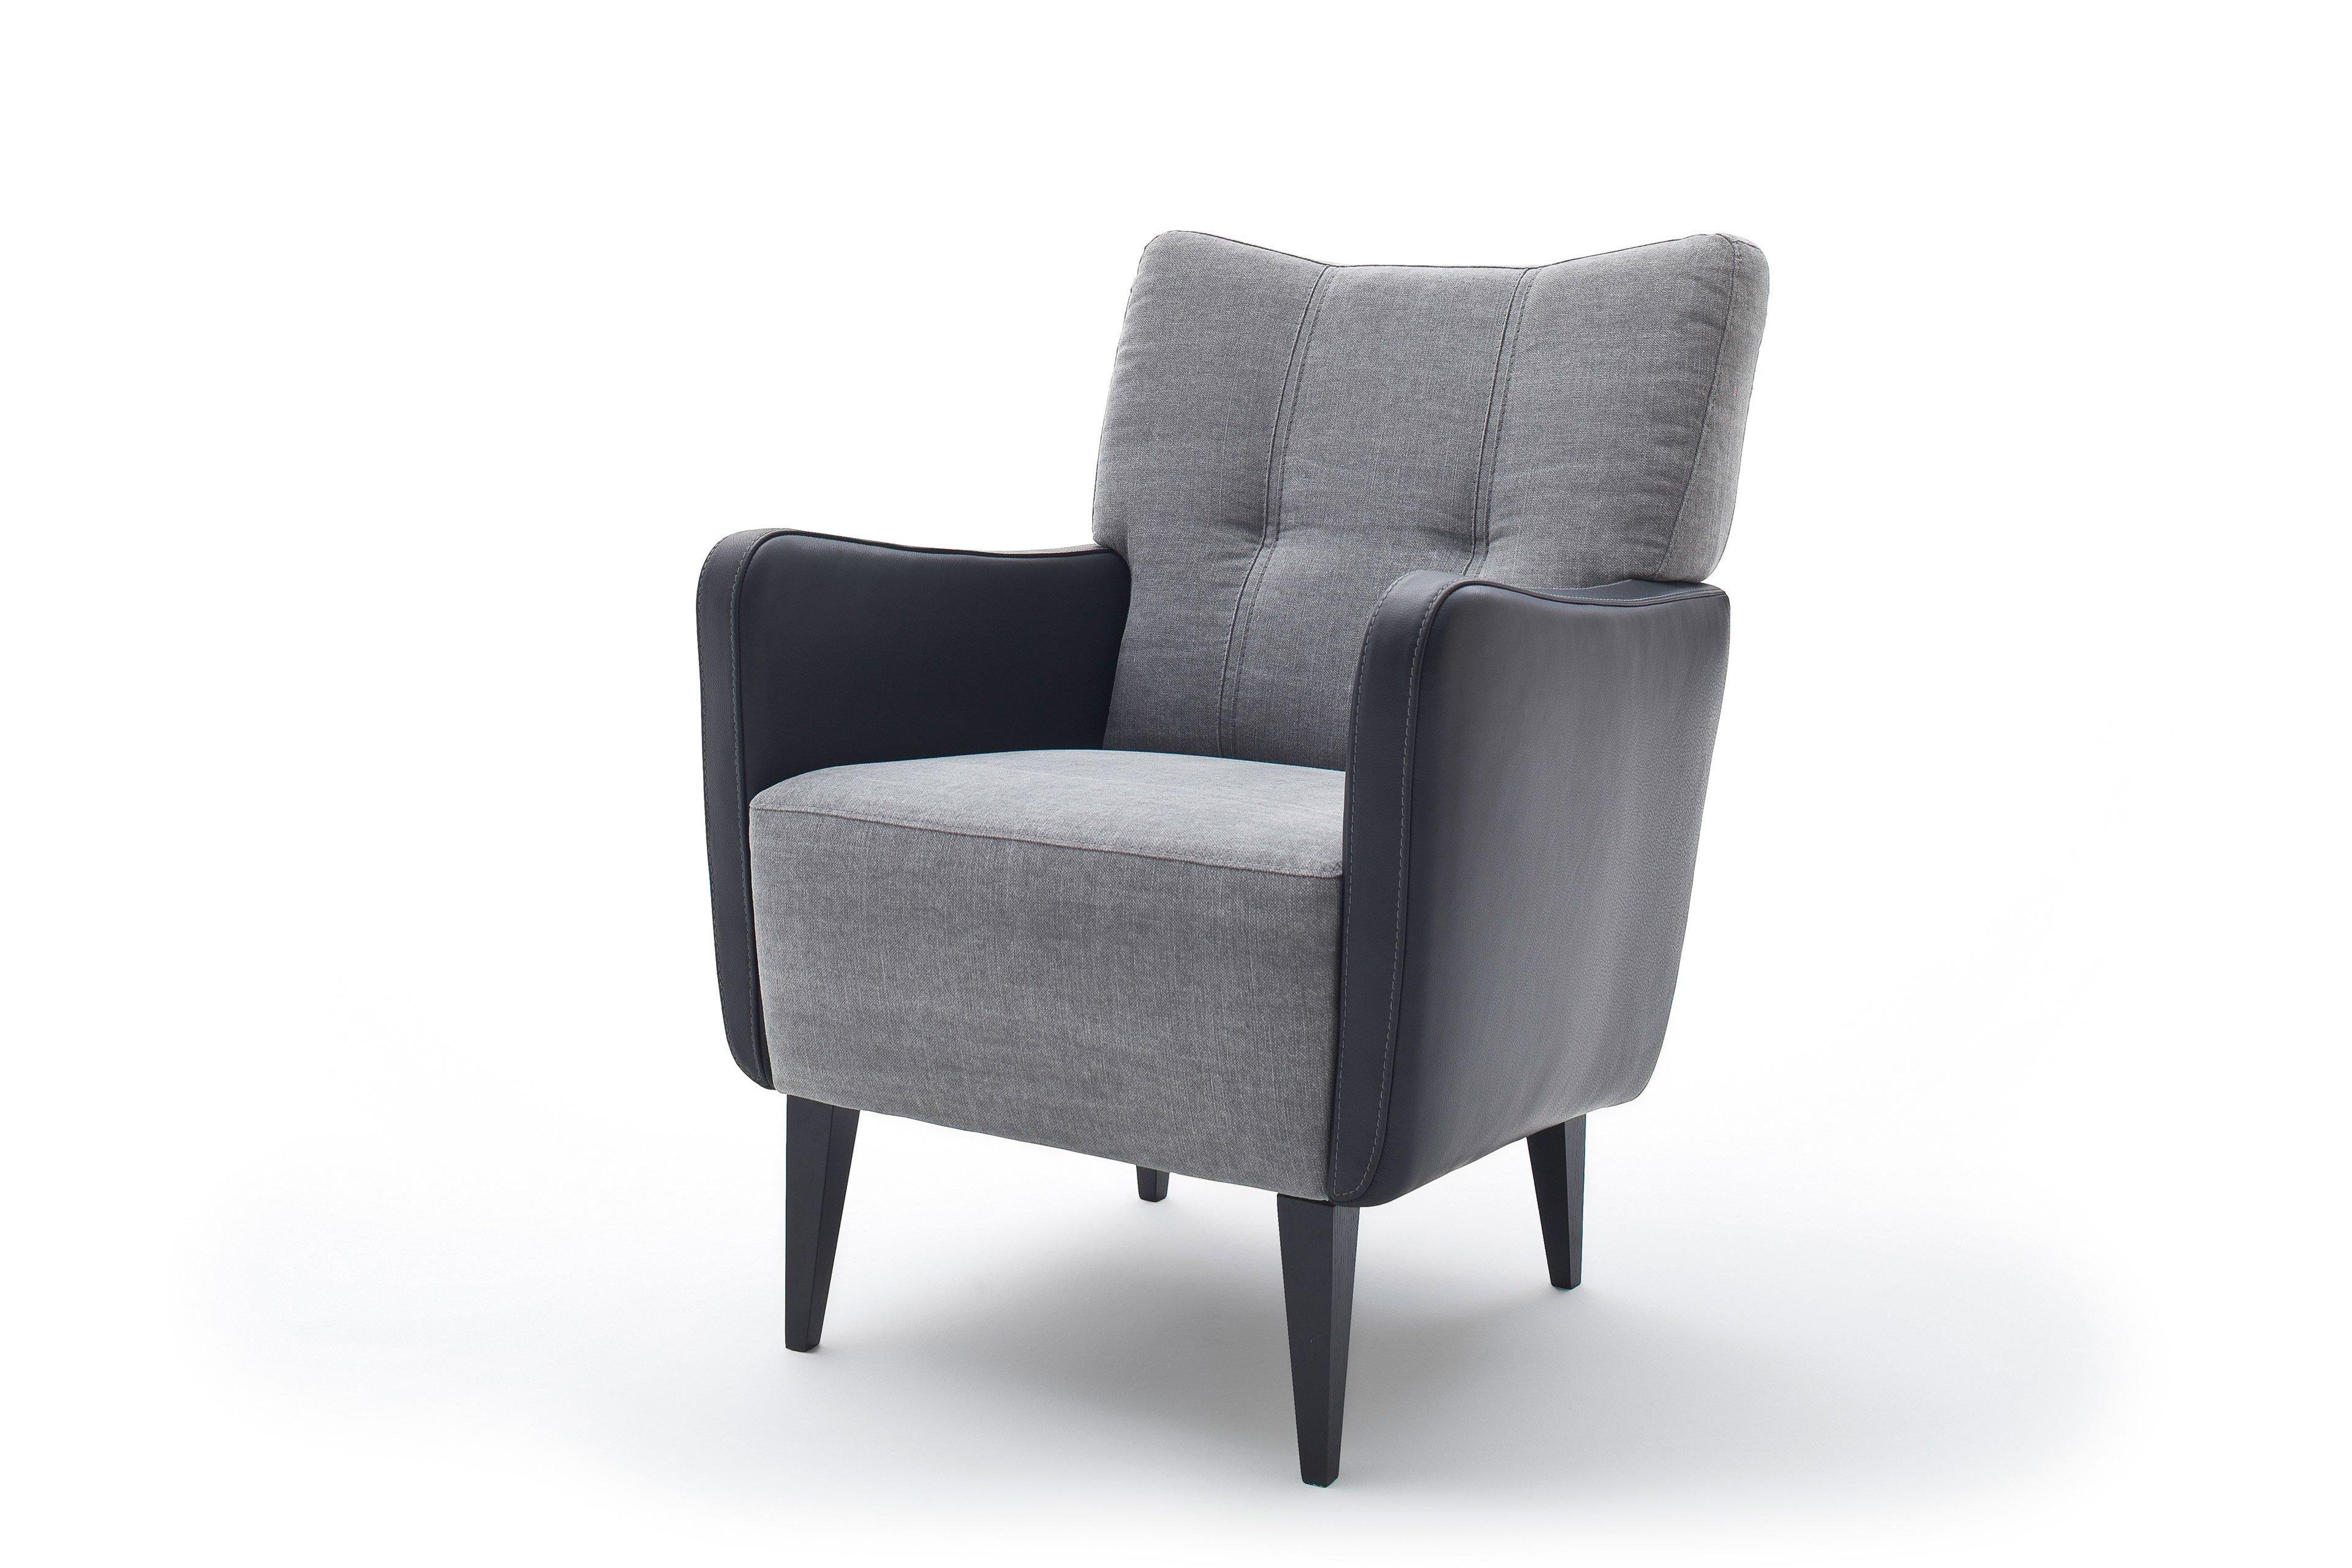 dfm polsterm bel maxim sessel grau schwarz m bel letz ihr online shop. Black Bedroom Furniture Sets. Home Design Ideas